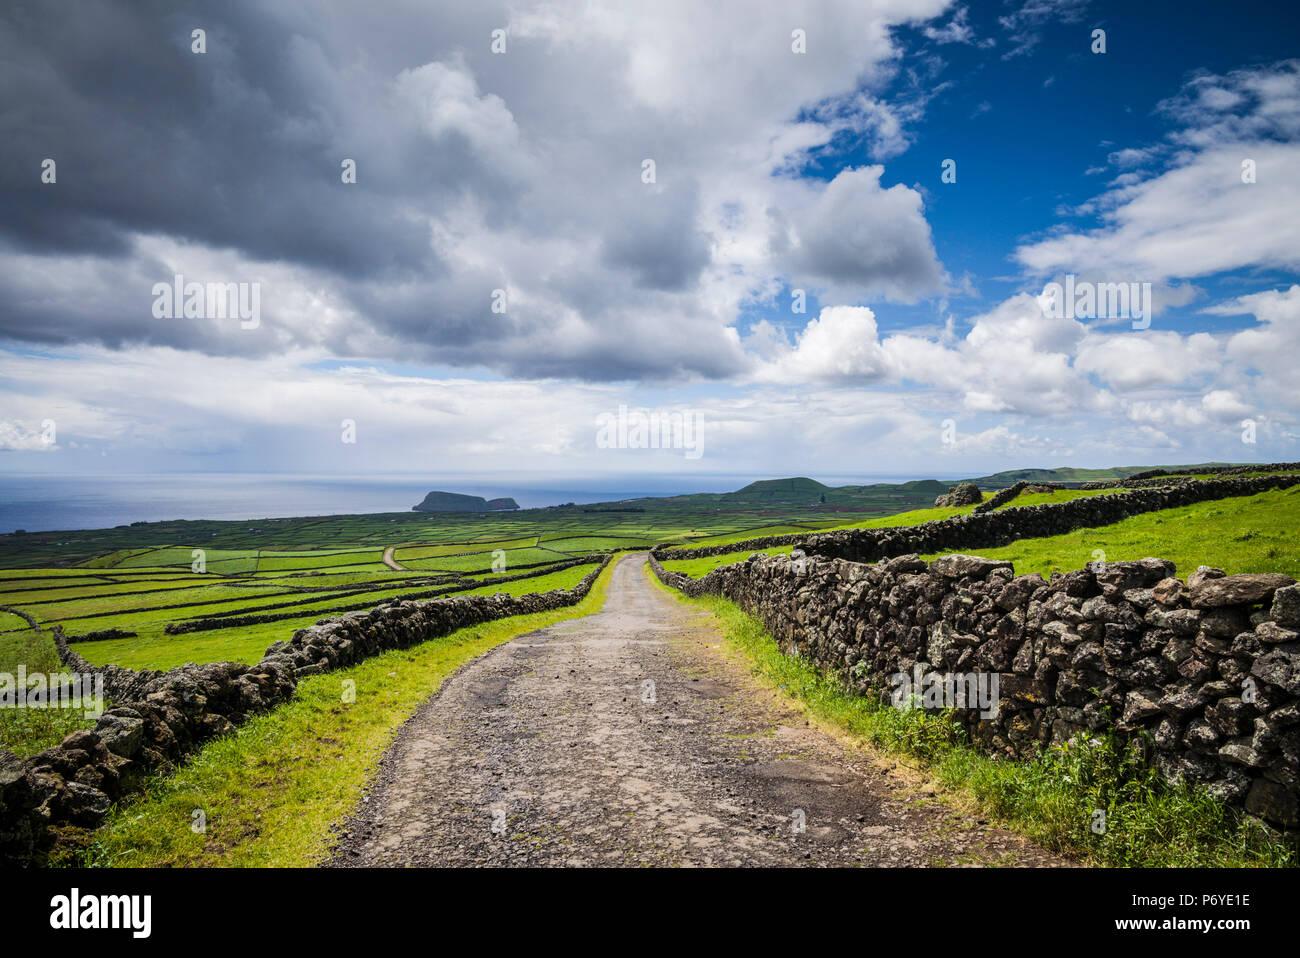 Le Portugal, Açores, l'île de Terceira, Serra do cume, mur de pierre Photo Stock